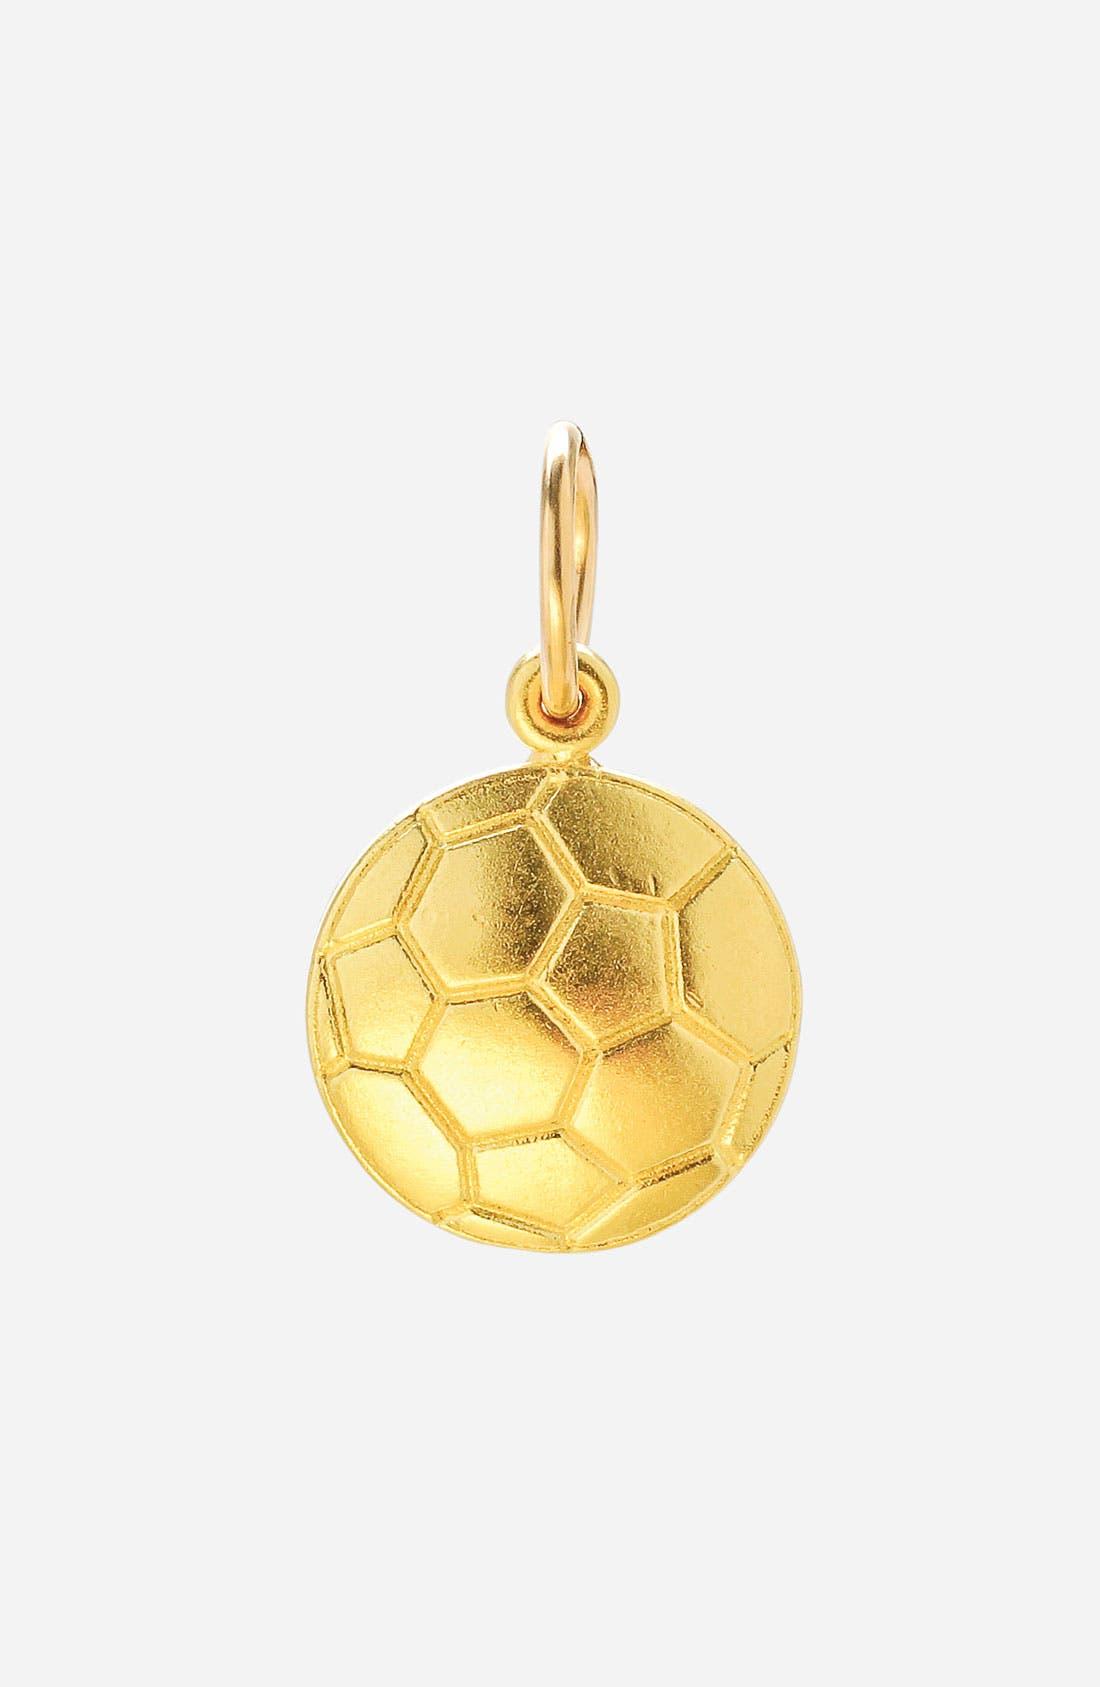 Main Image - Dogeared 'Create - Hobby' Soccer Ball Charm